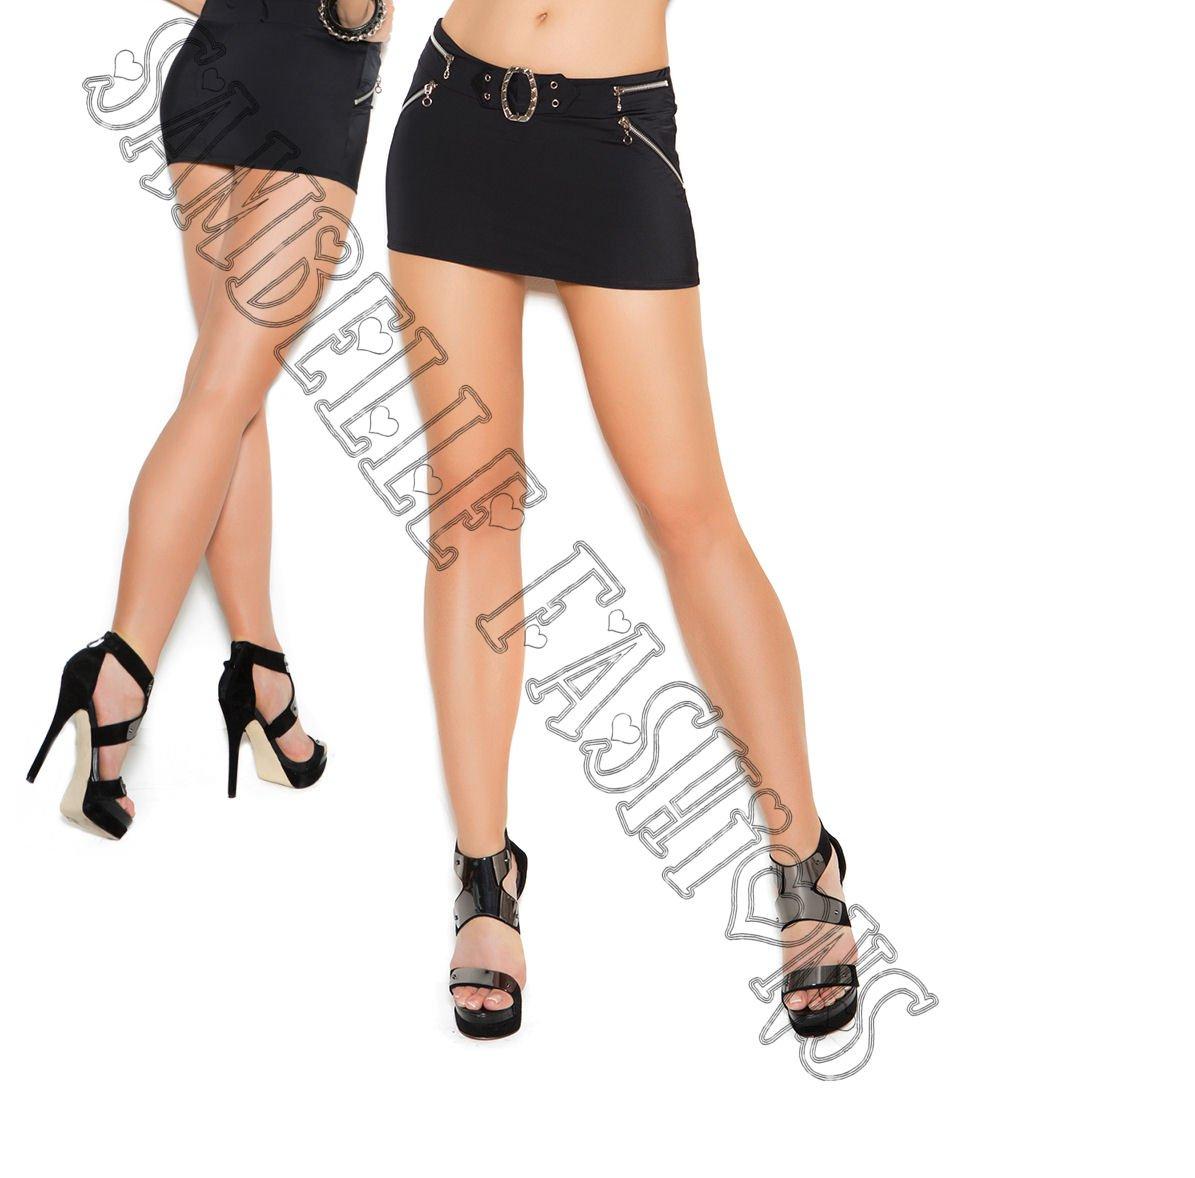 Black Lycra Mini Skirt w/ Buckle & Zippers - 2X